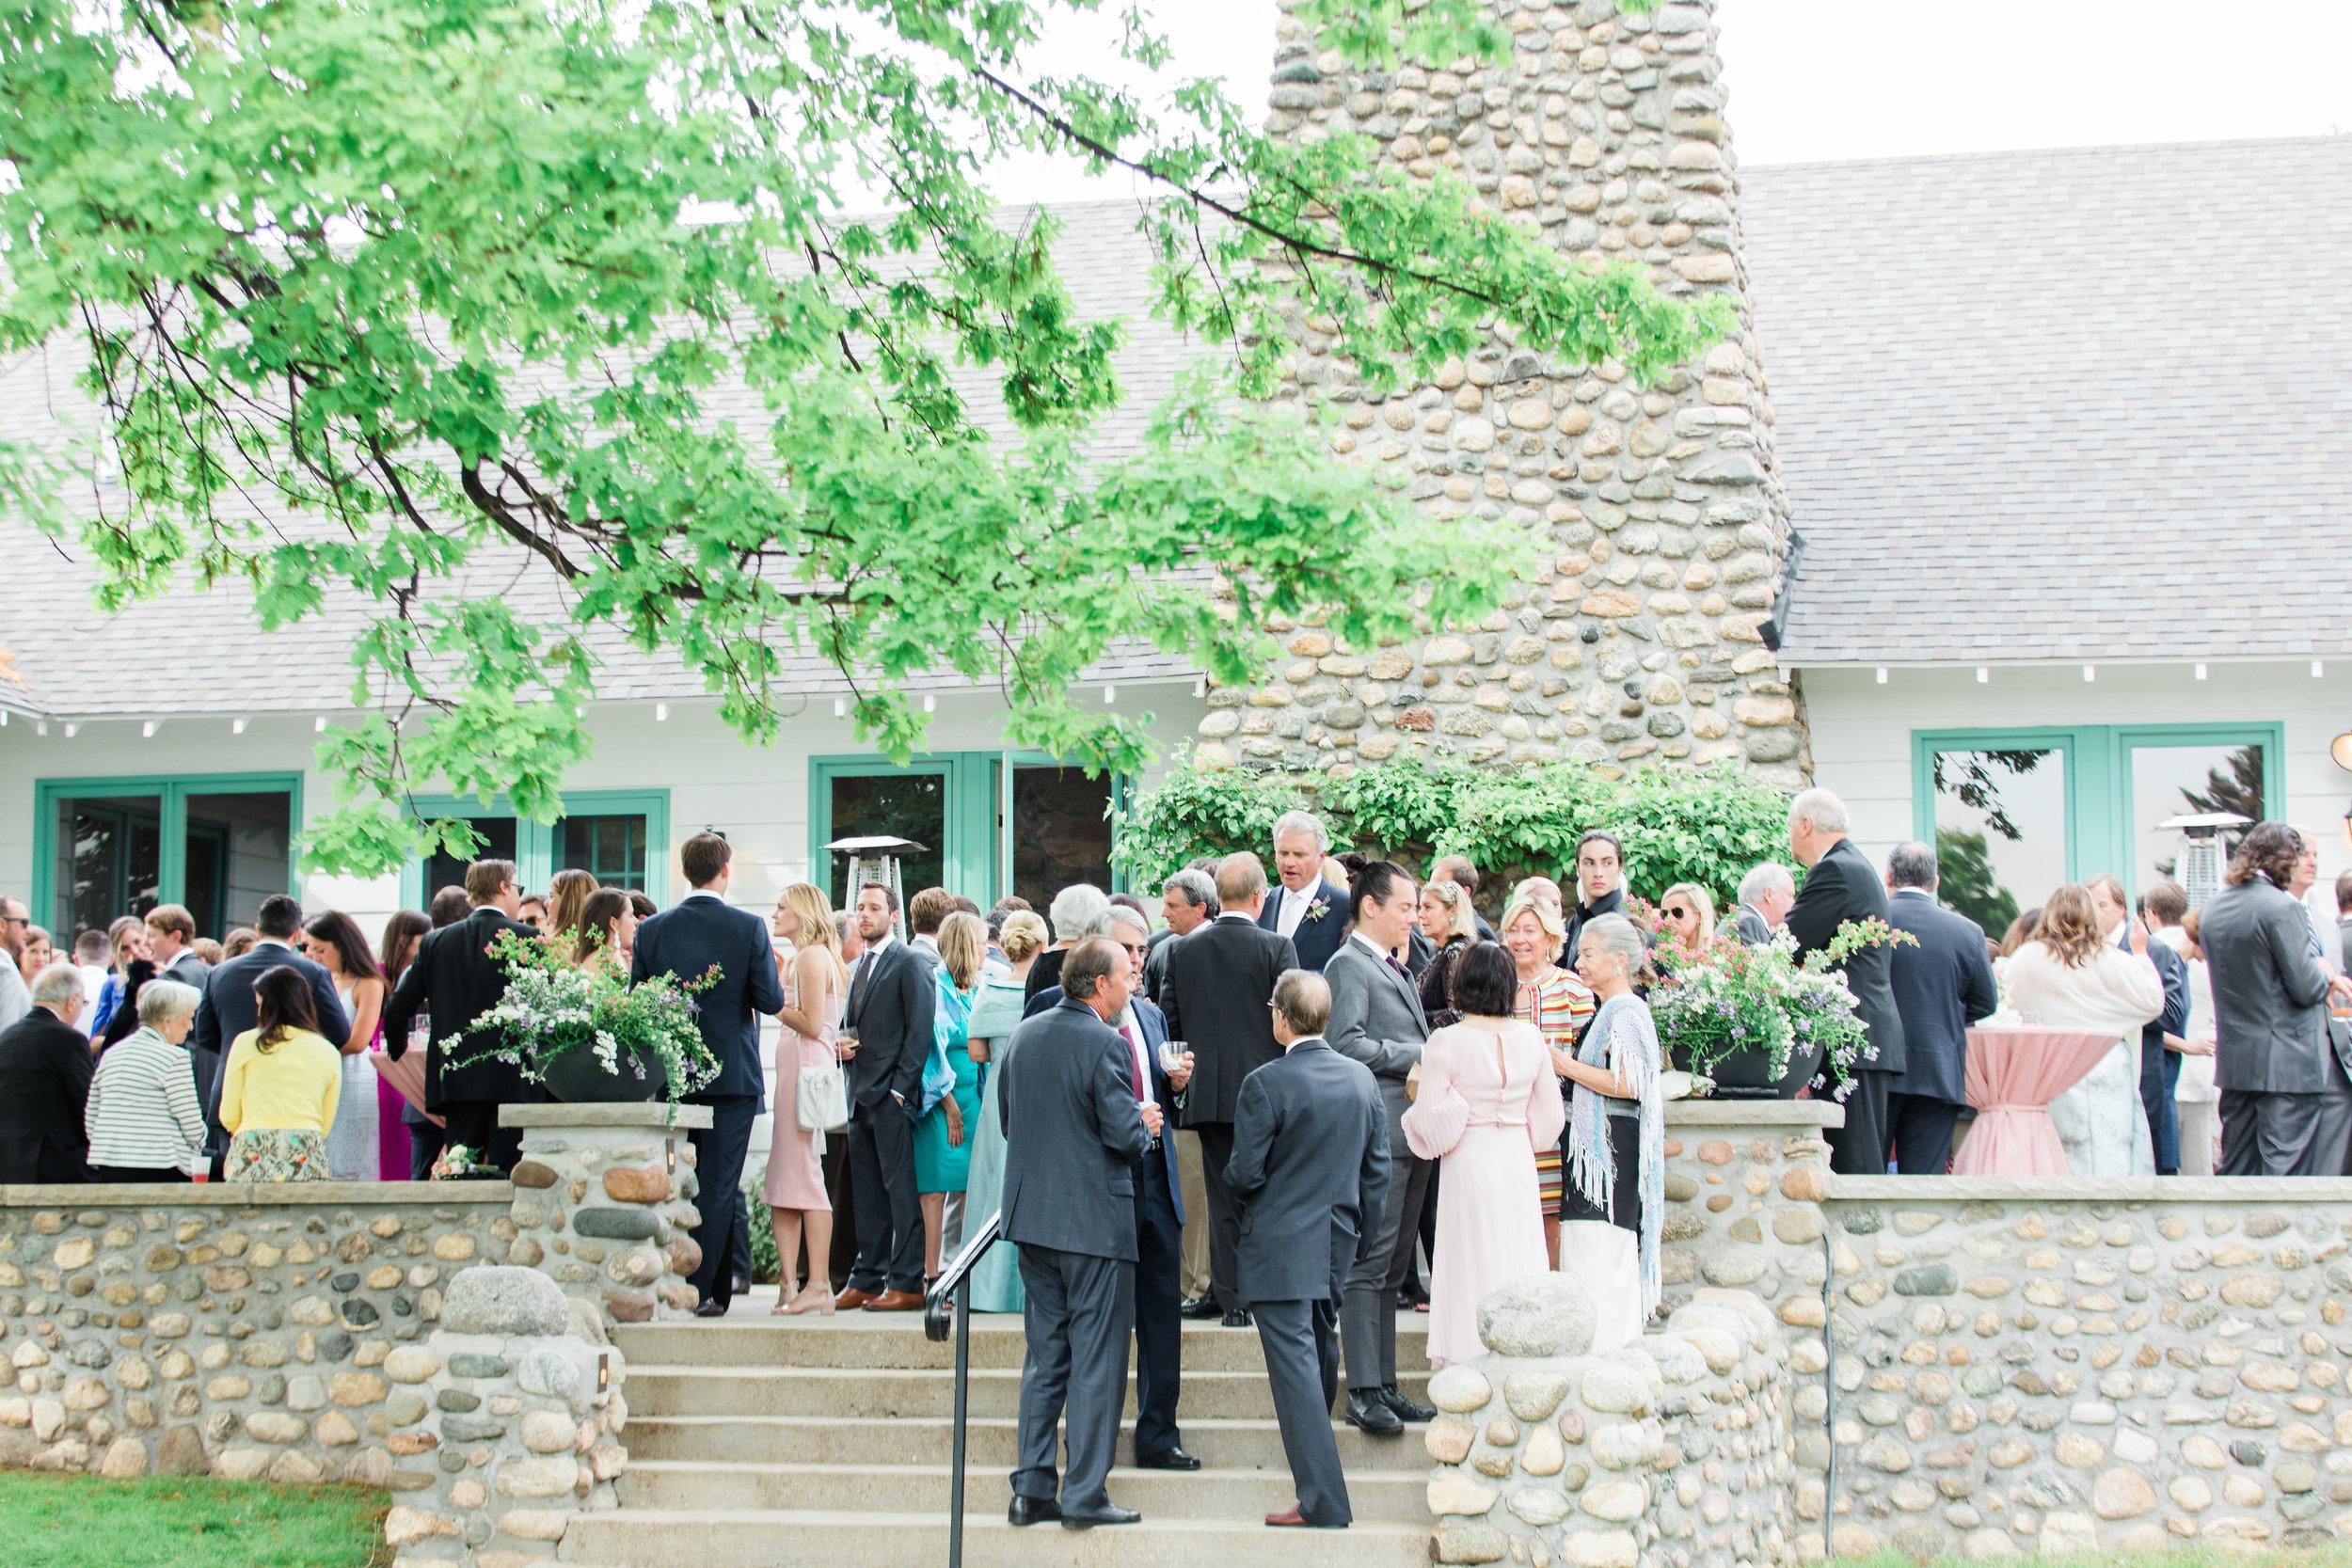 Coffman+Wedding+Cocktail+Hour-43.jpg